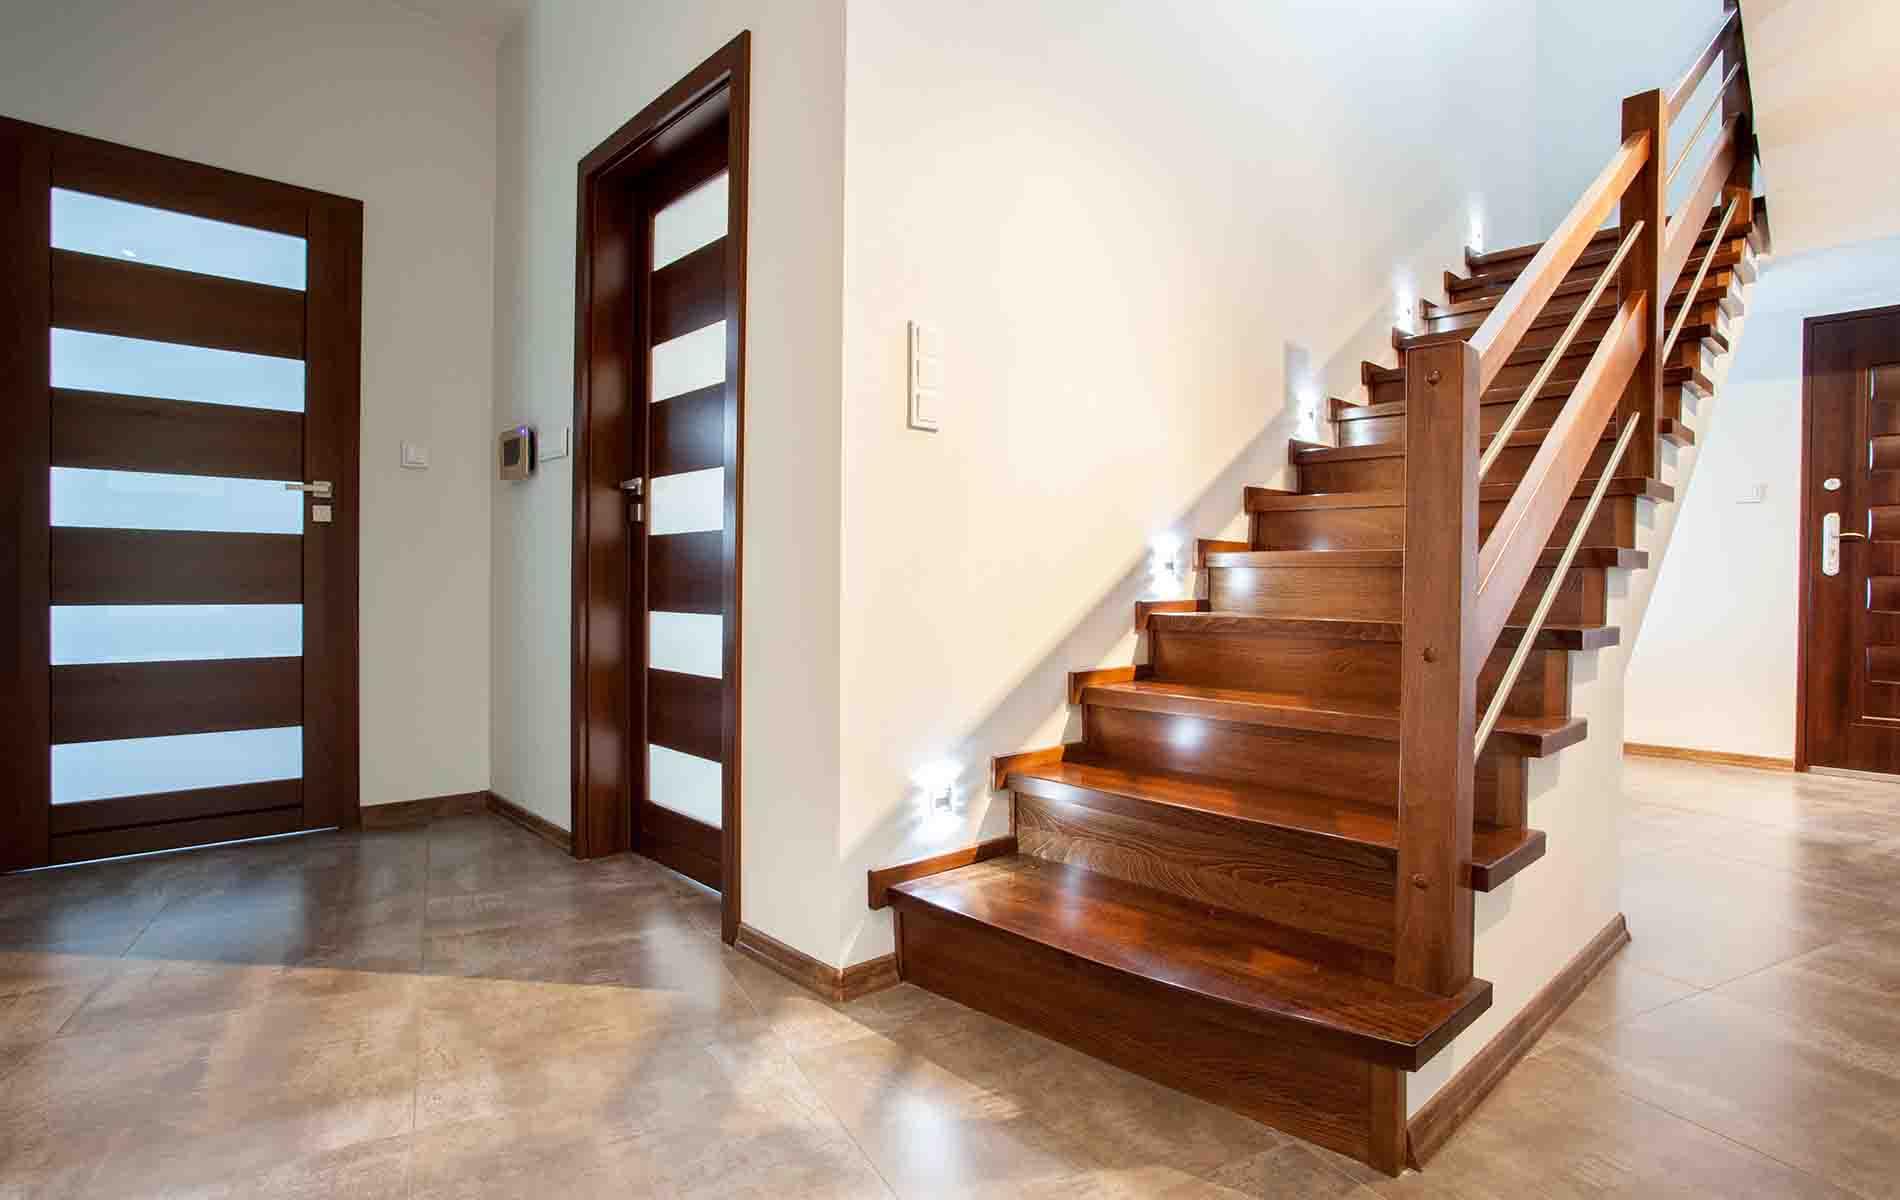 Escaleras de madera a medida santiago de compostela